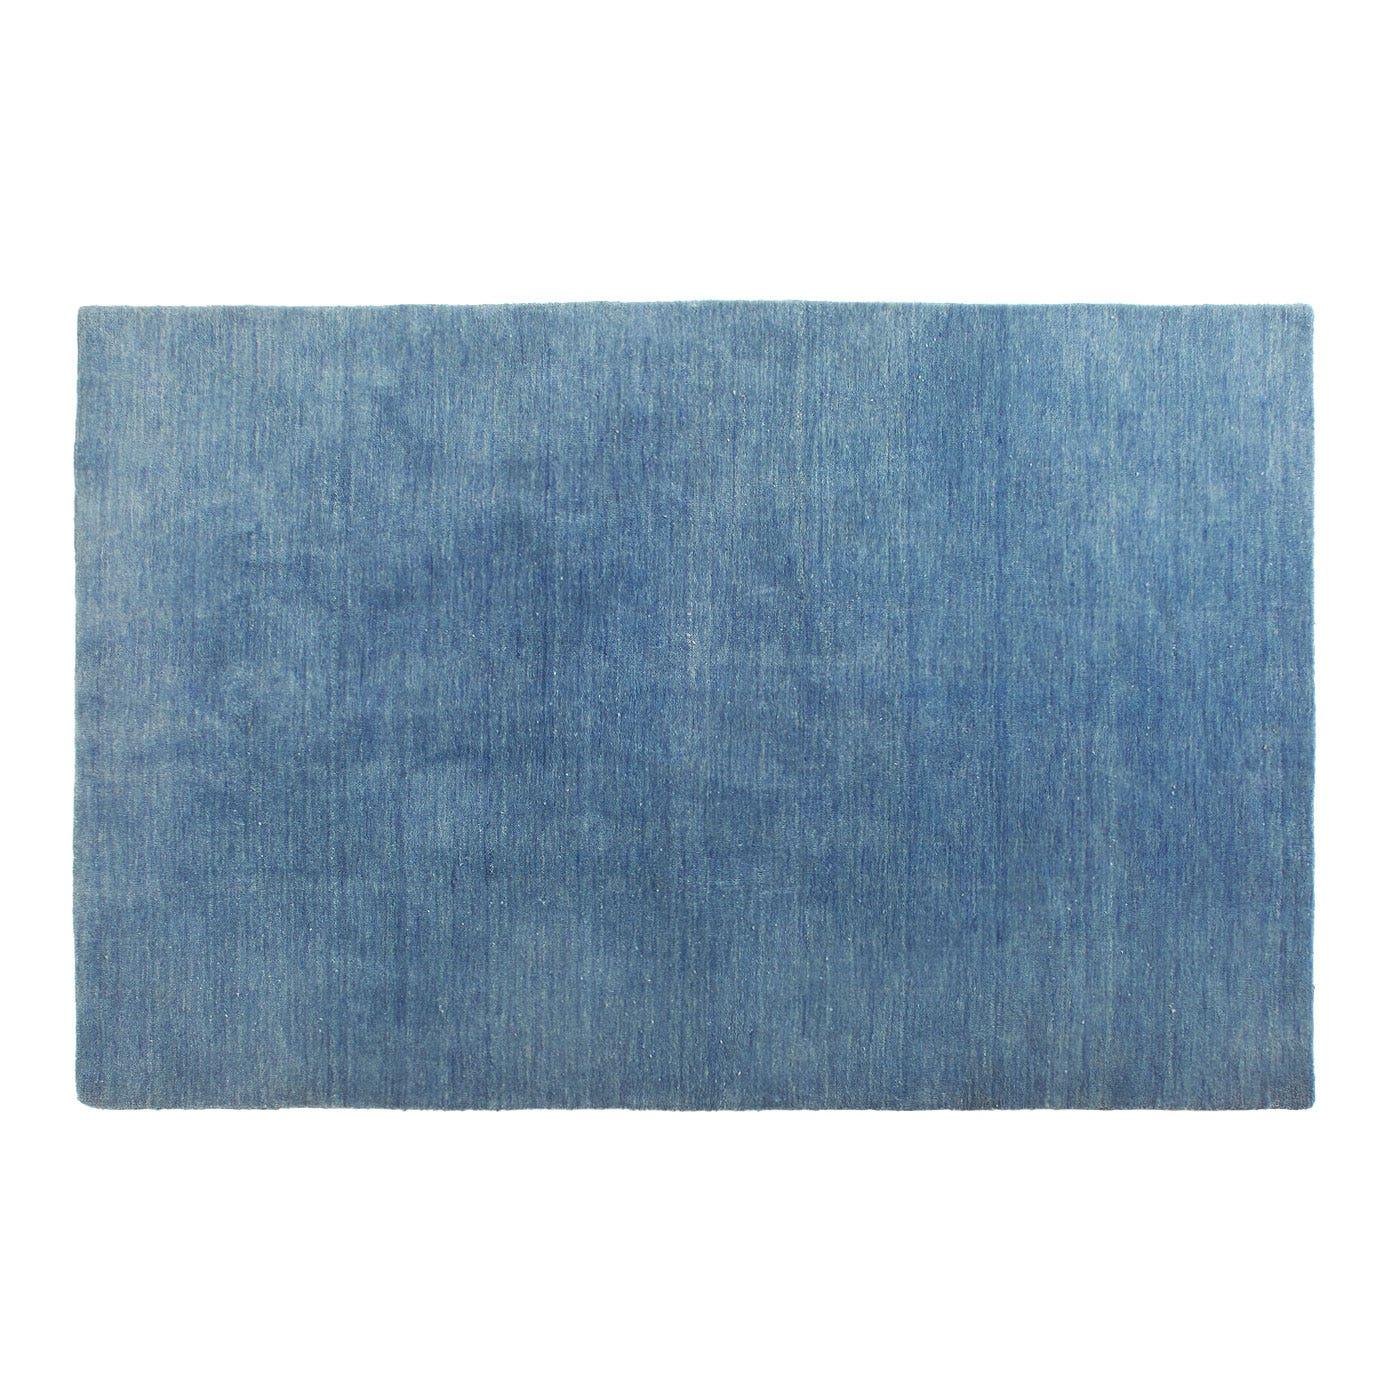 hotel 3' x 5' rug - hand knotted wool rug | blu dot